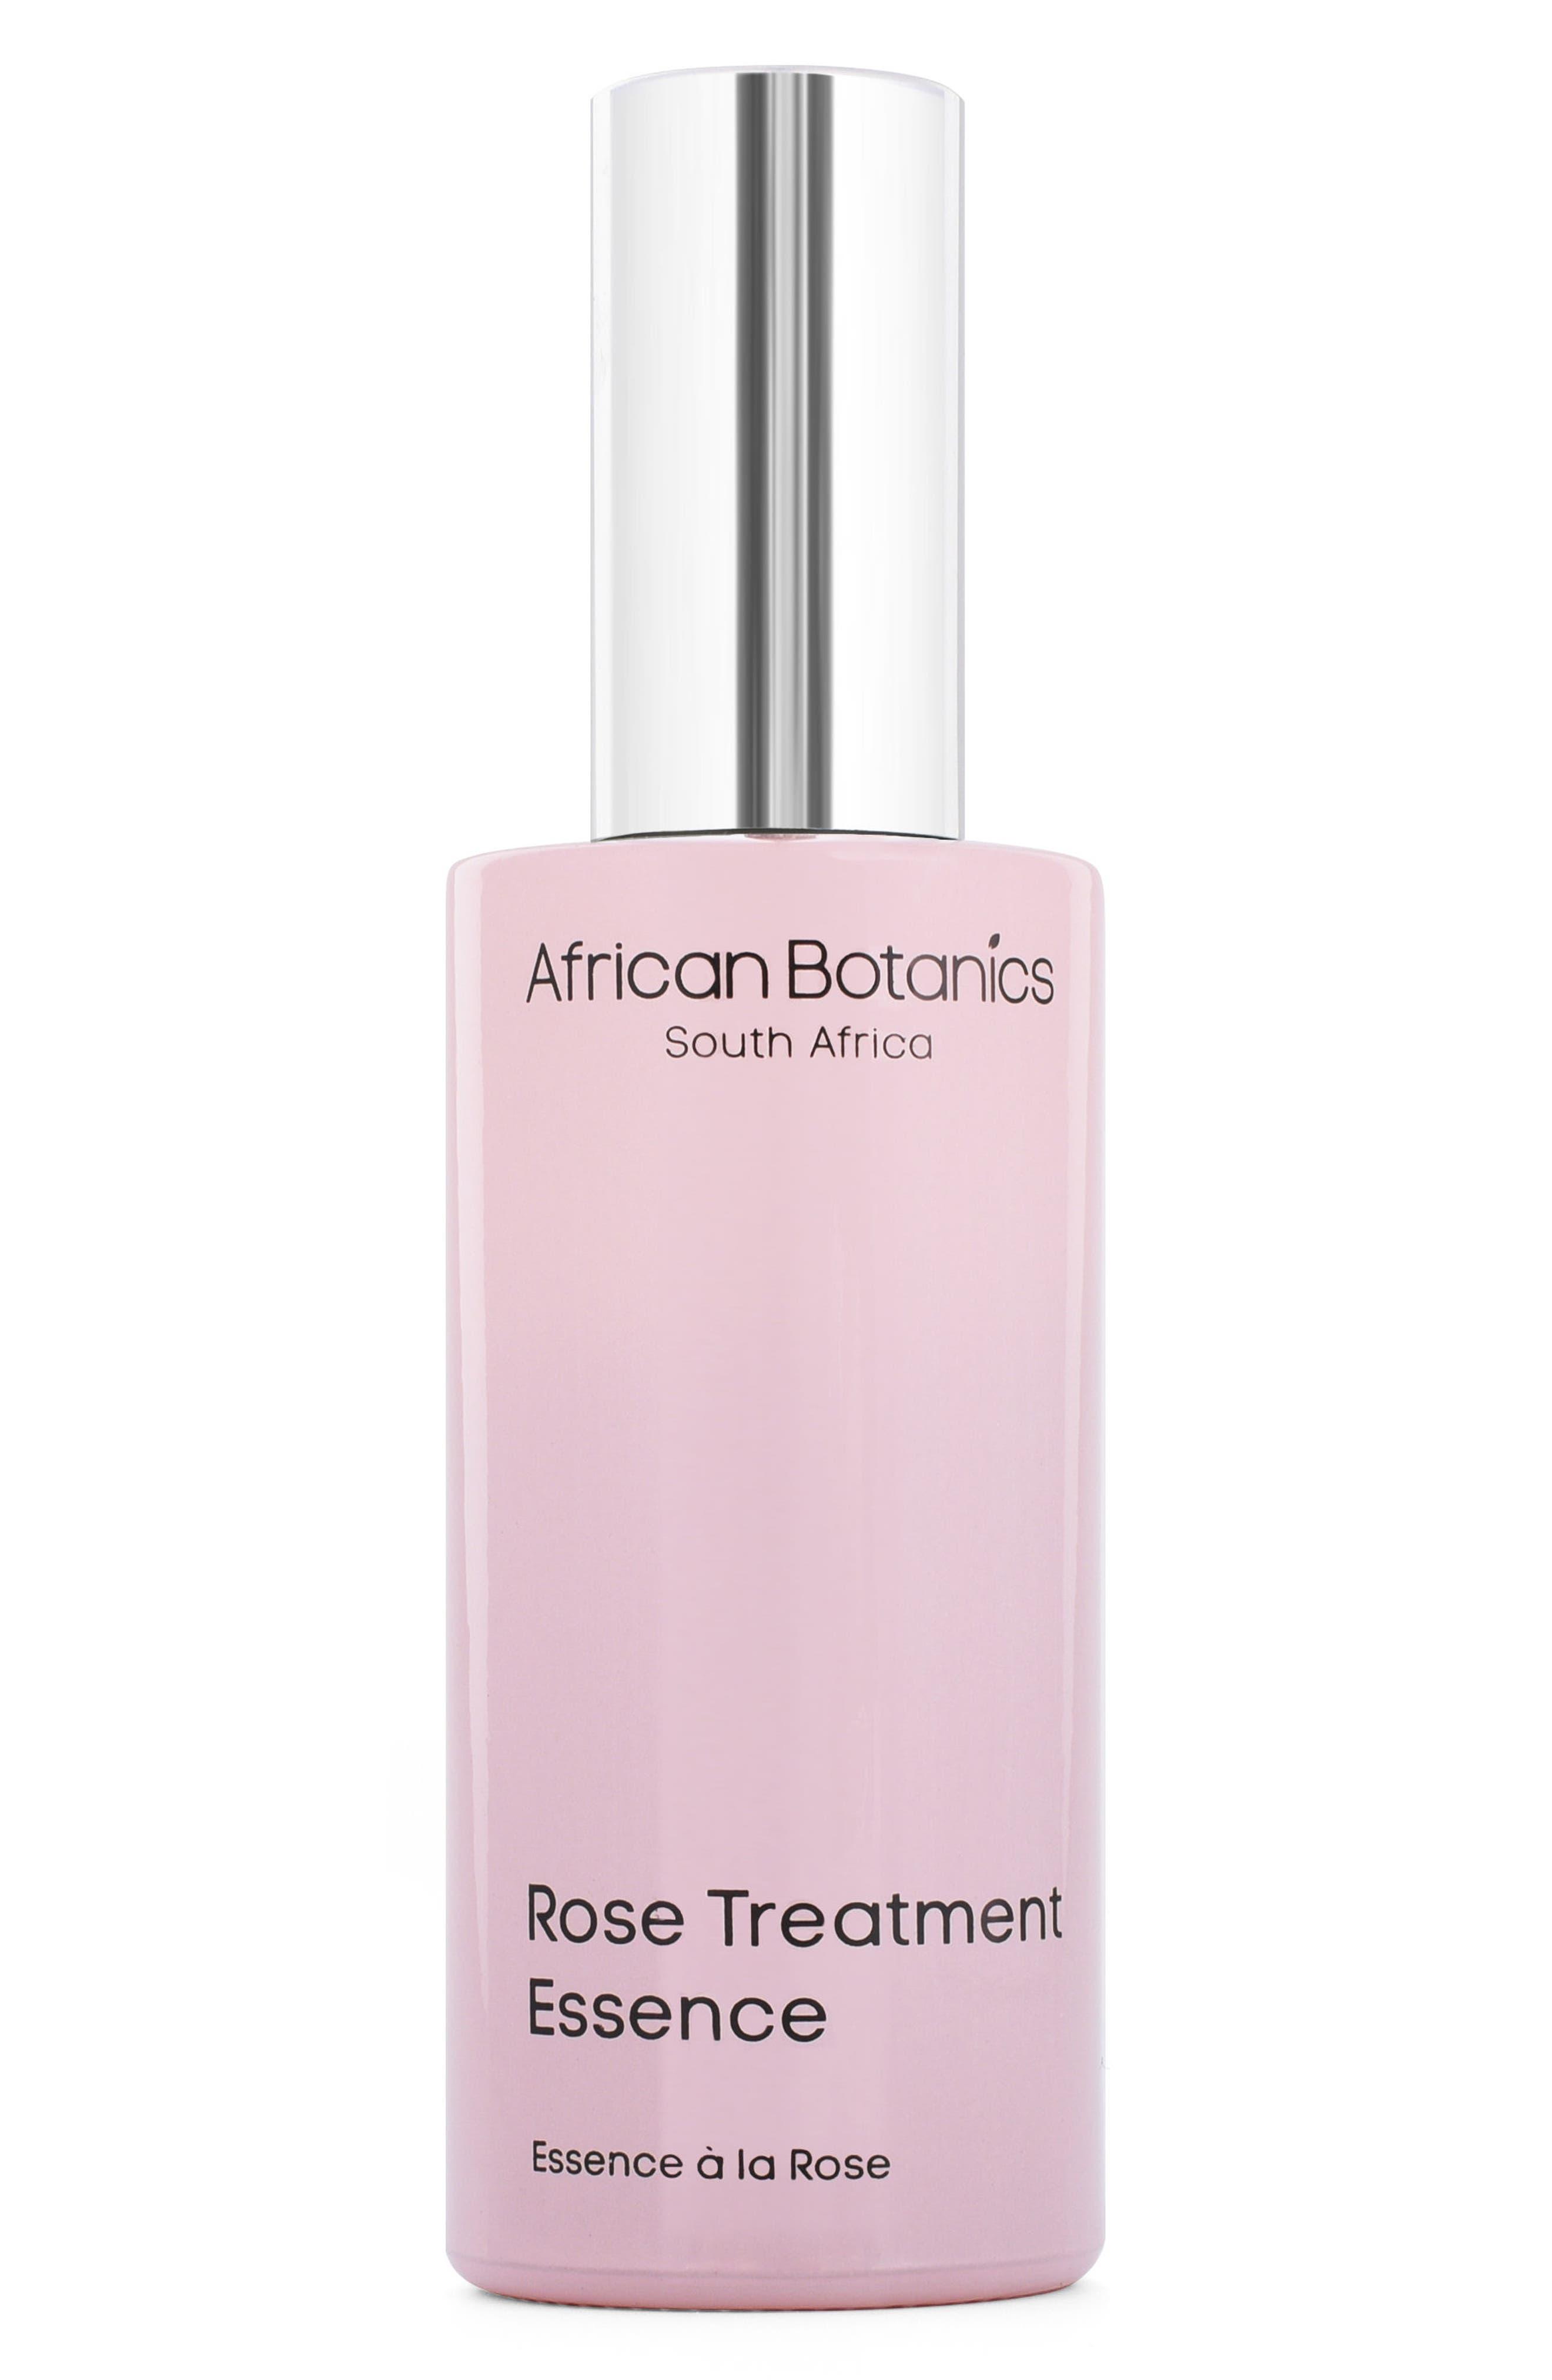 African Botanics Rose Treatment Essence